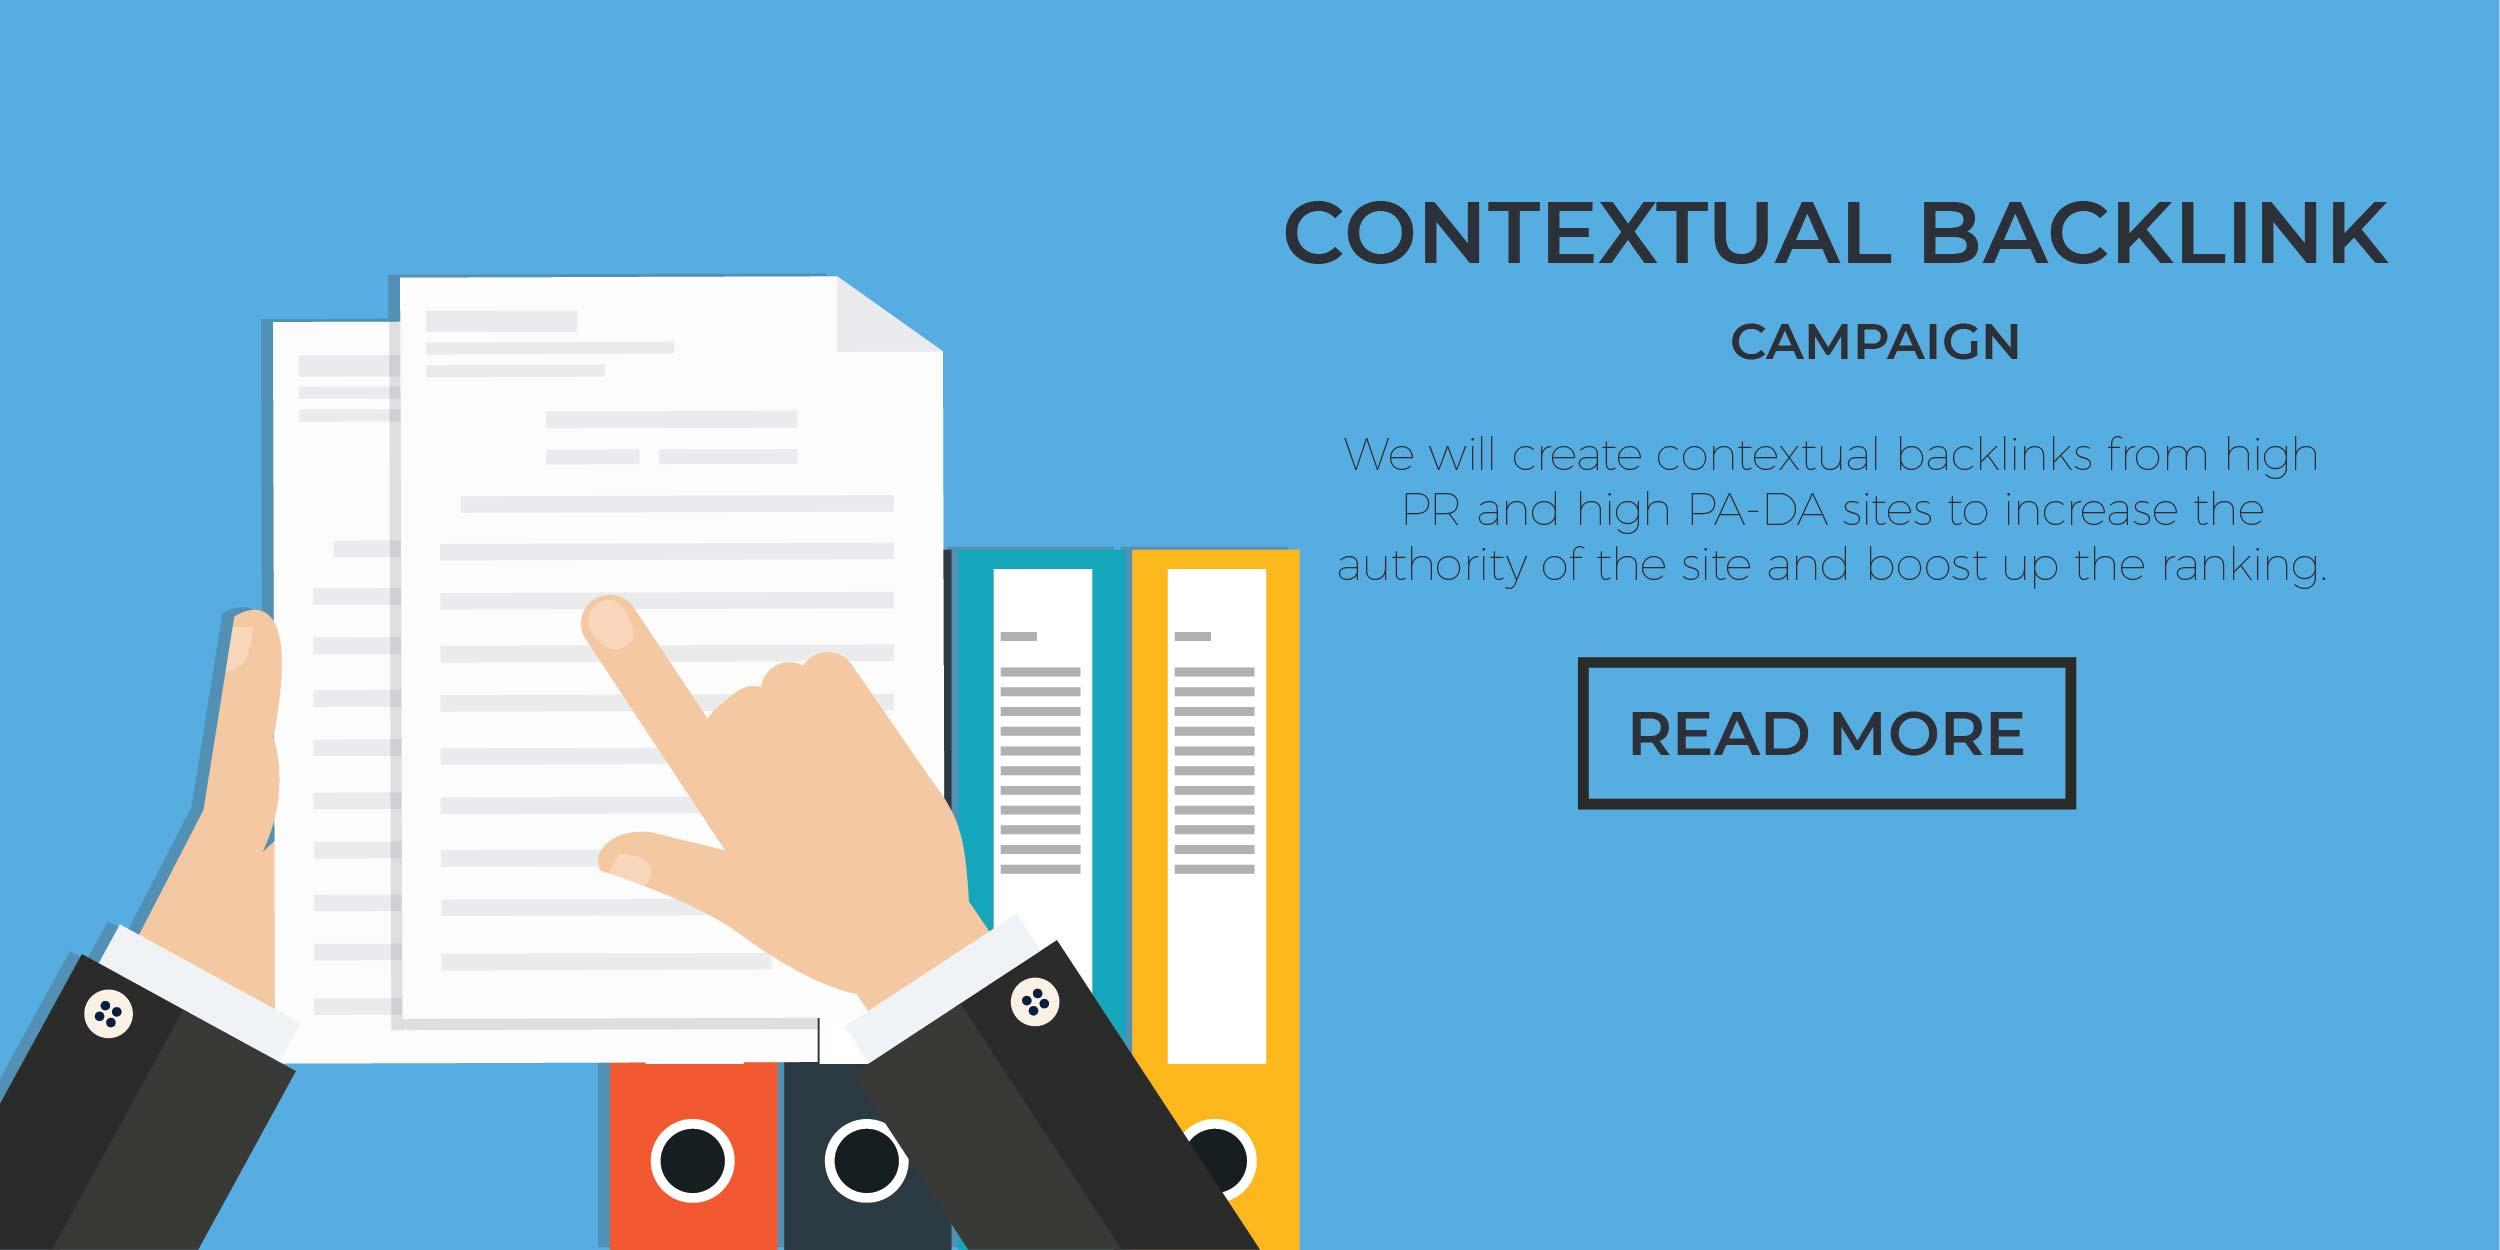 SEOviser - Contextual Backlink Campaign | SEOviser